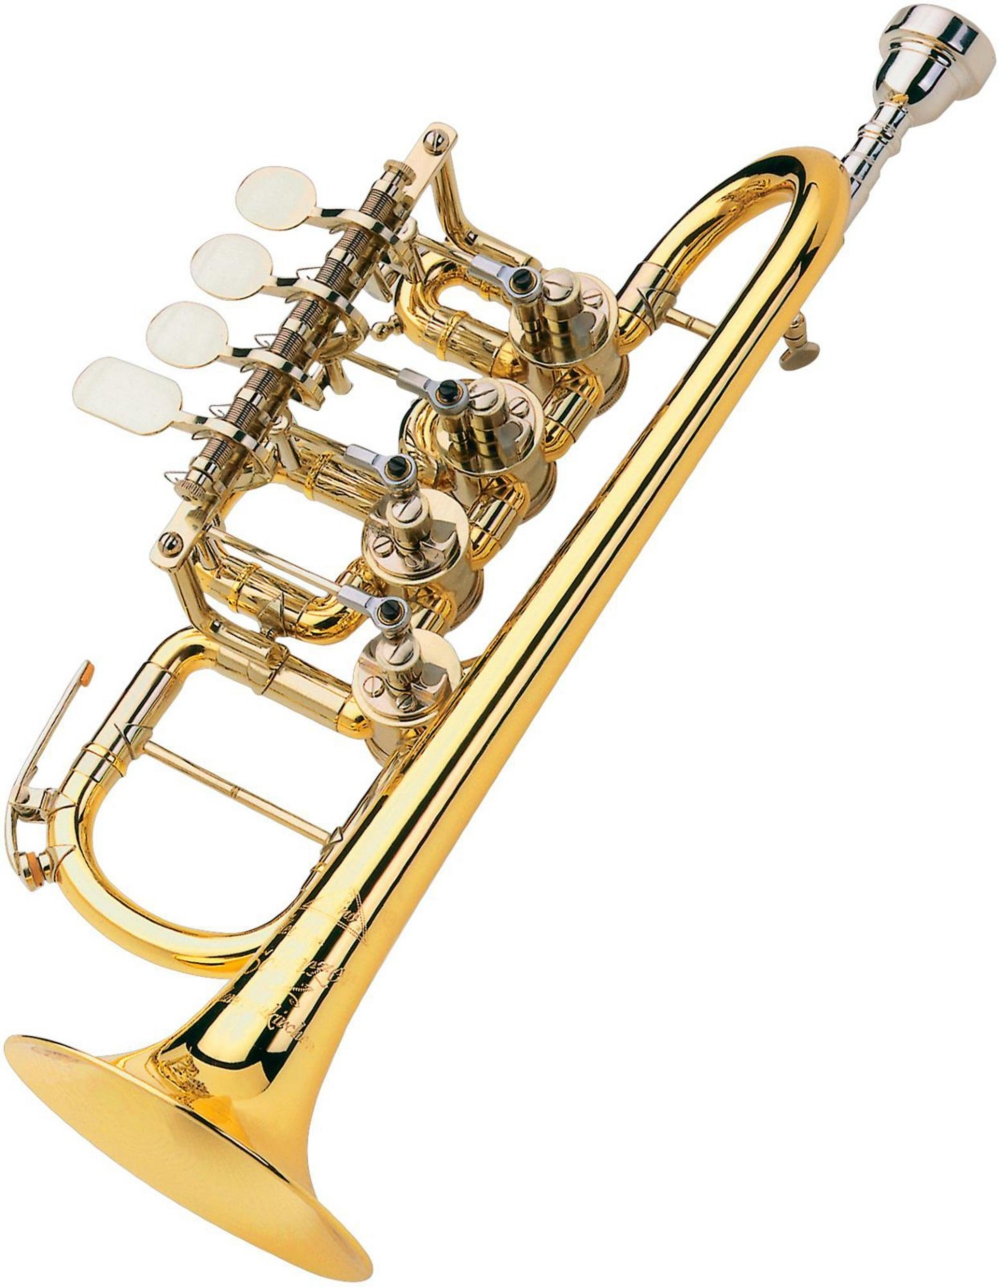 Meister Johannes Rotary Valve Piccolo Trumpet by Scherzer